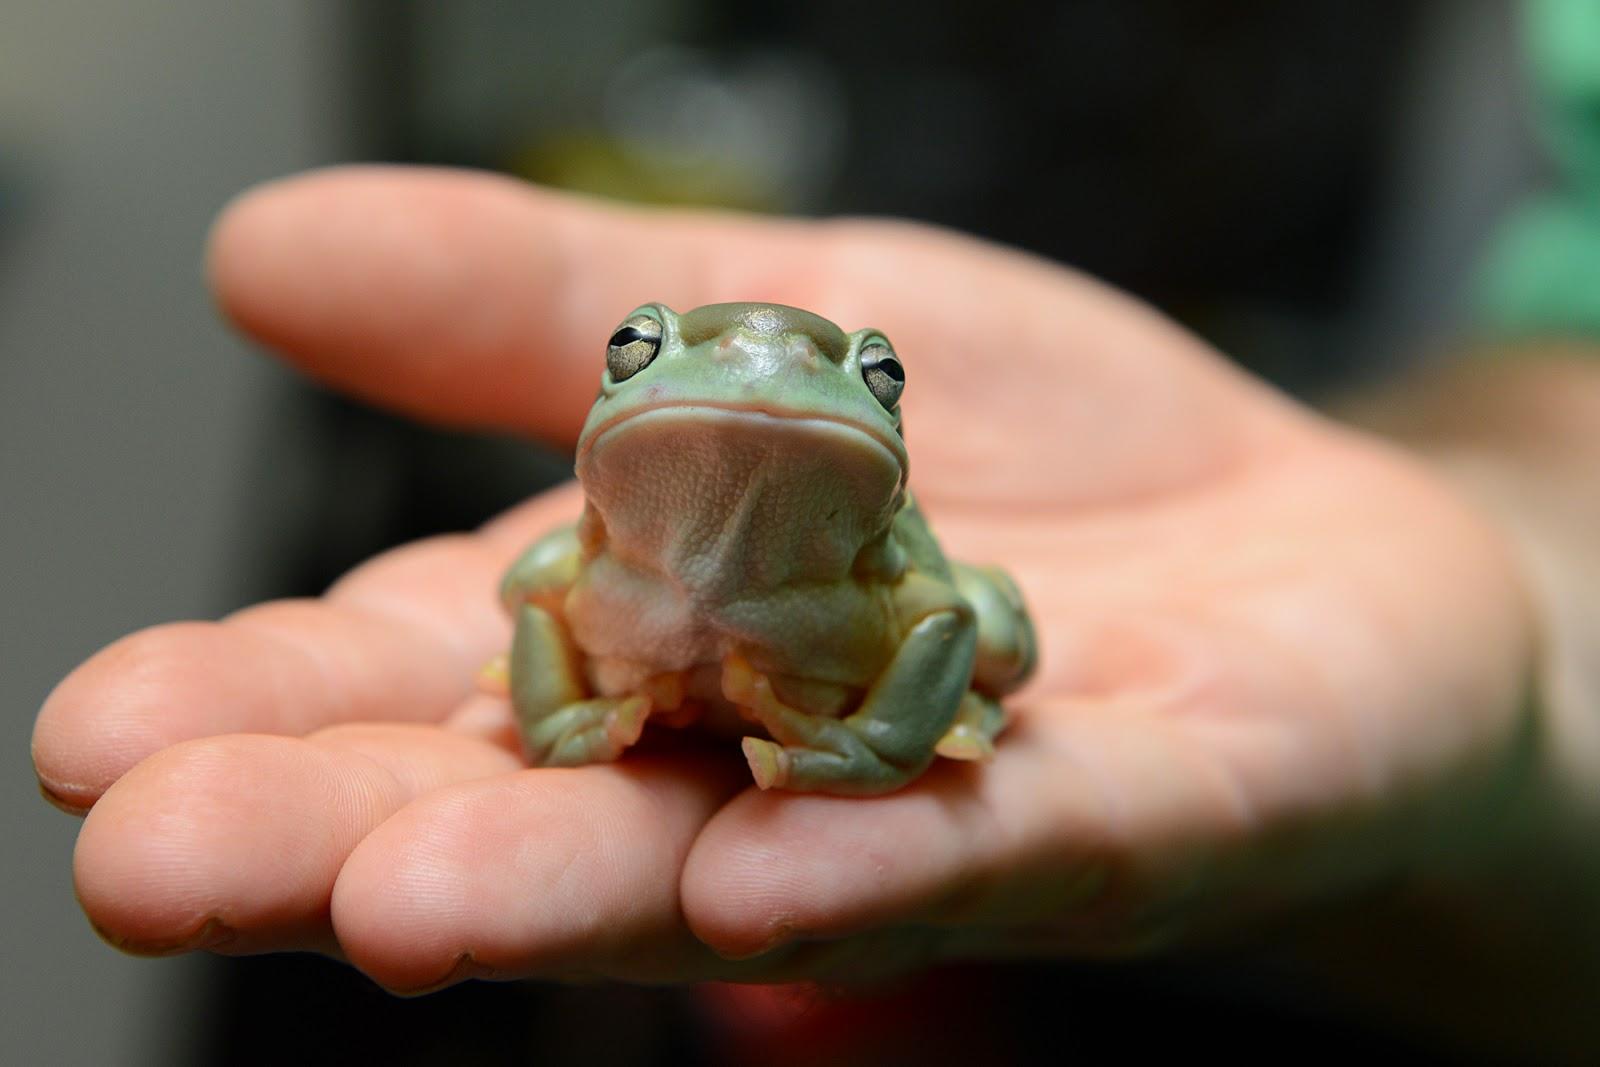 Magnificent Tree Frog/Splendid Tree Frog